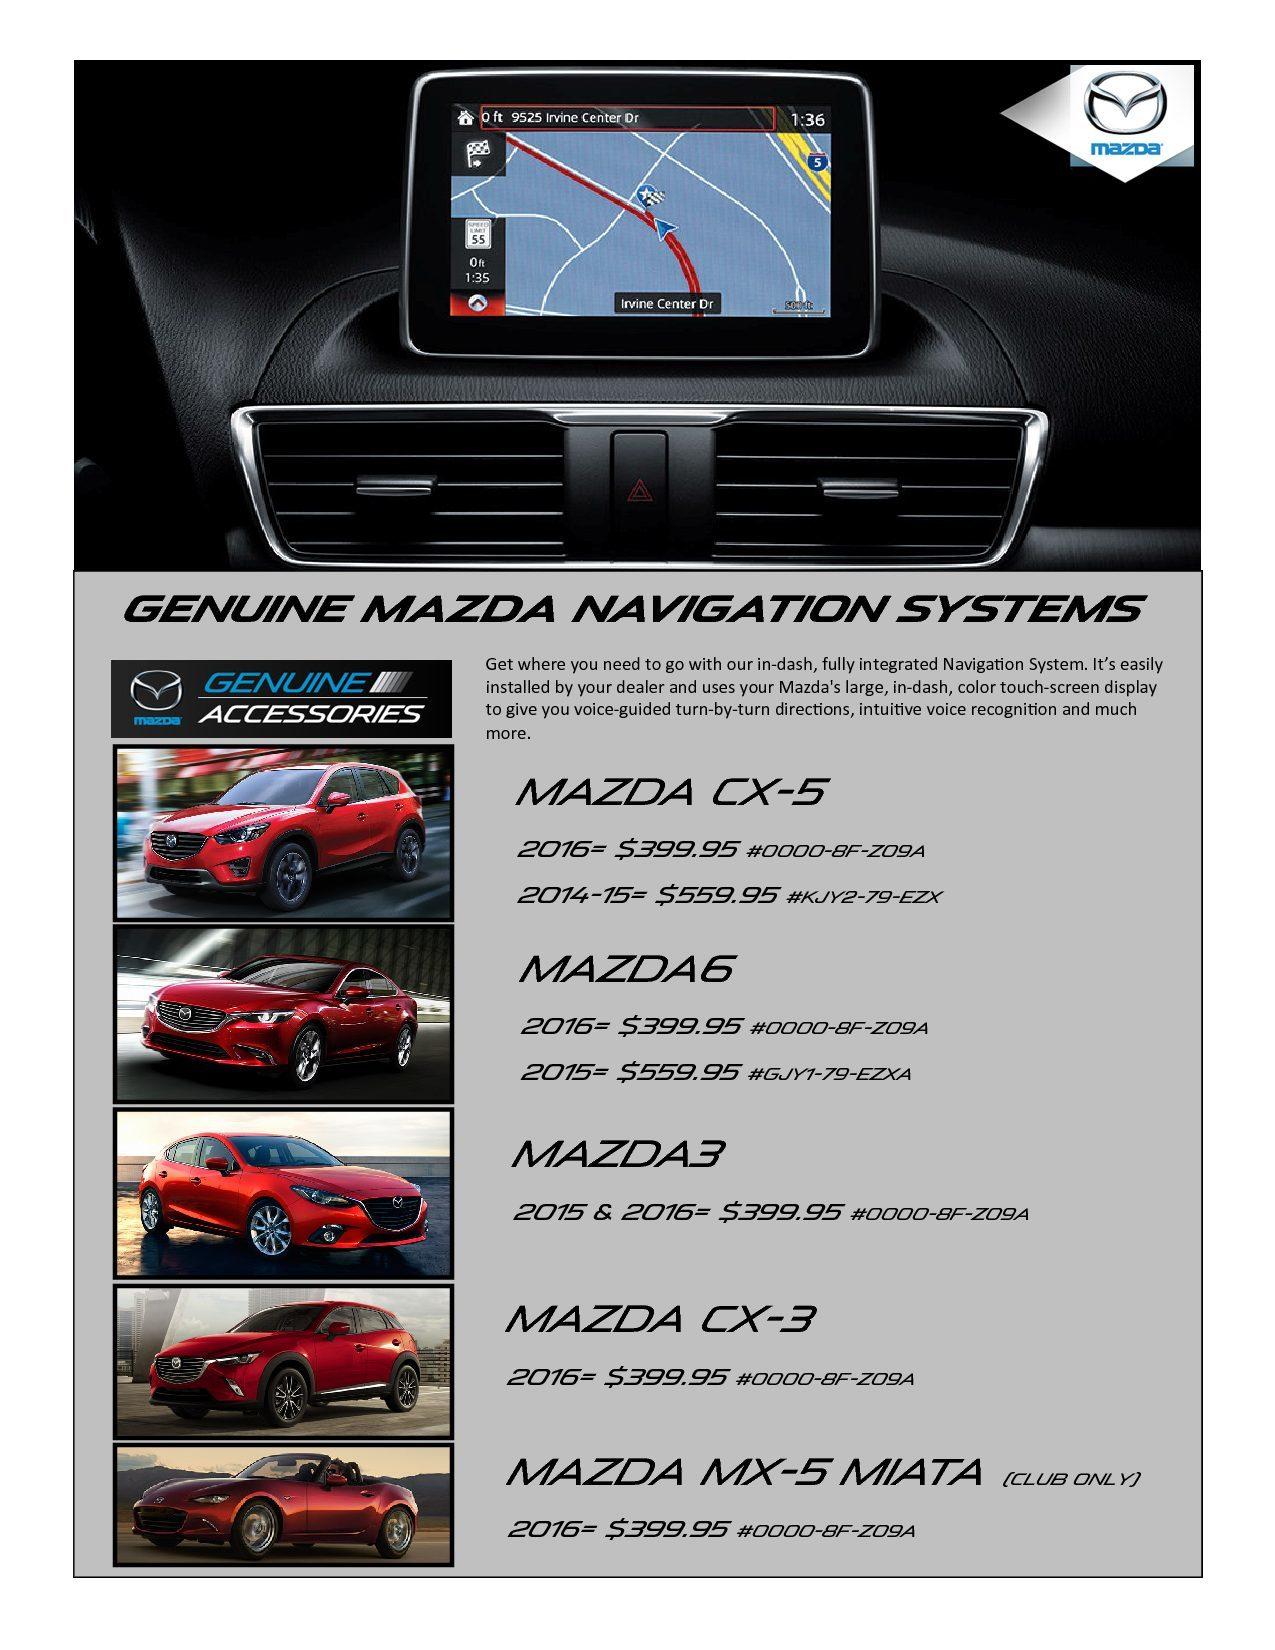 2016 mazda cx 5 navigation install